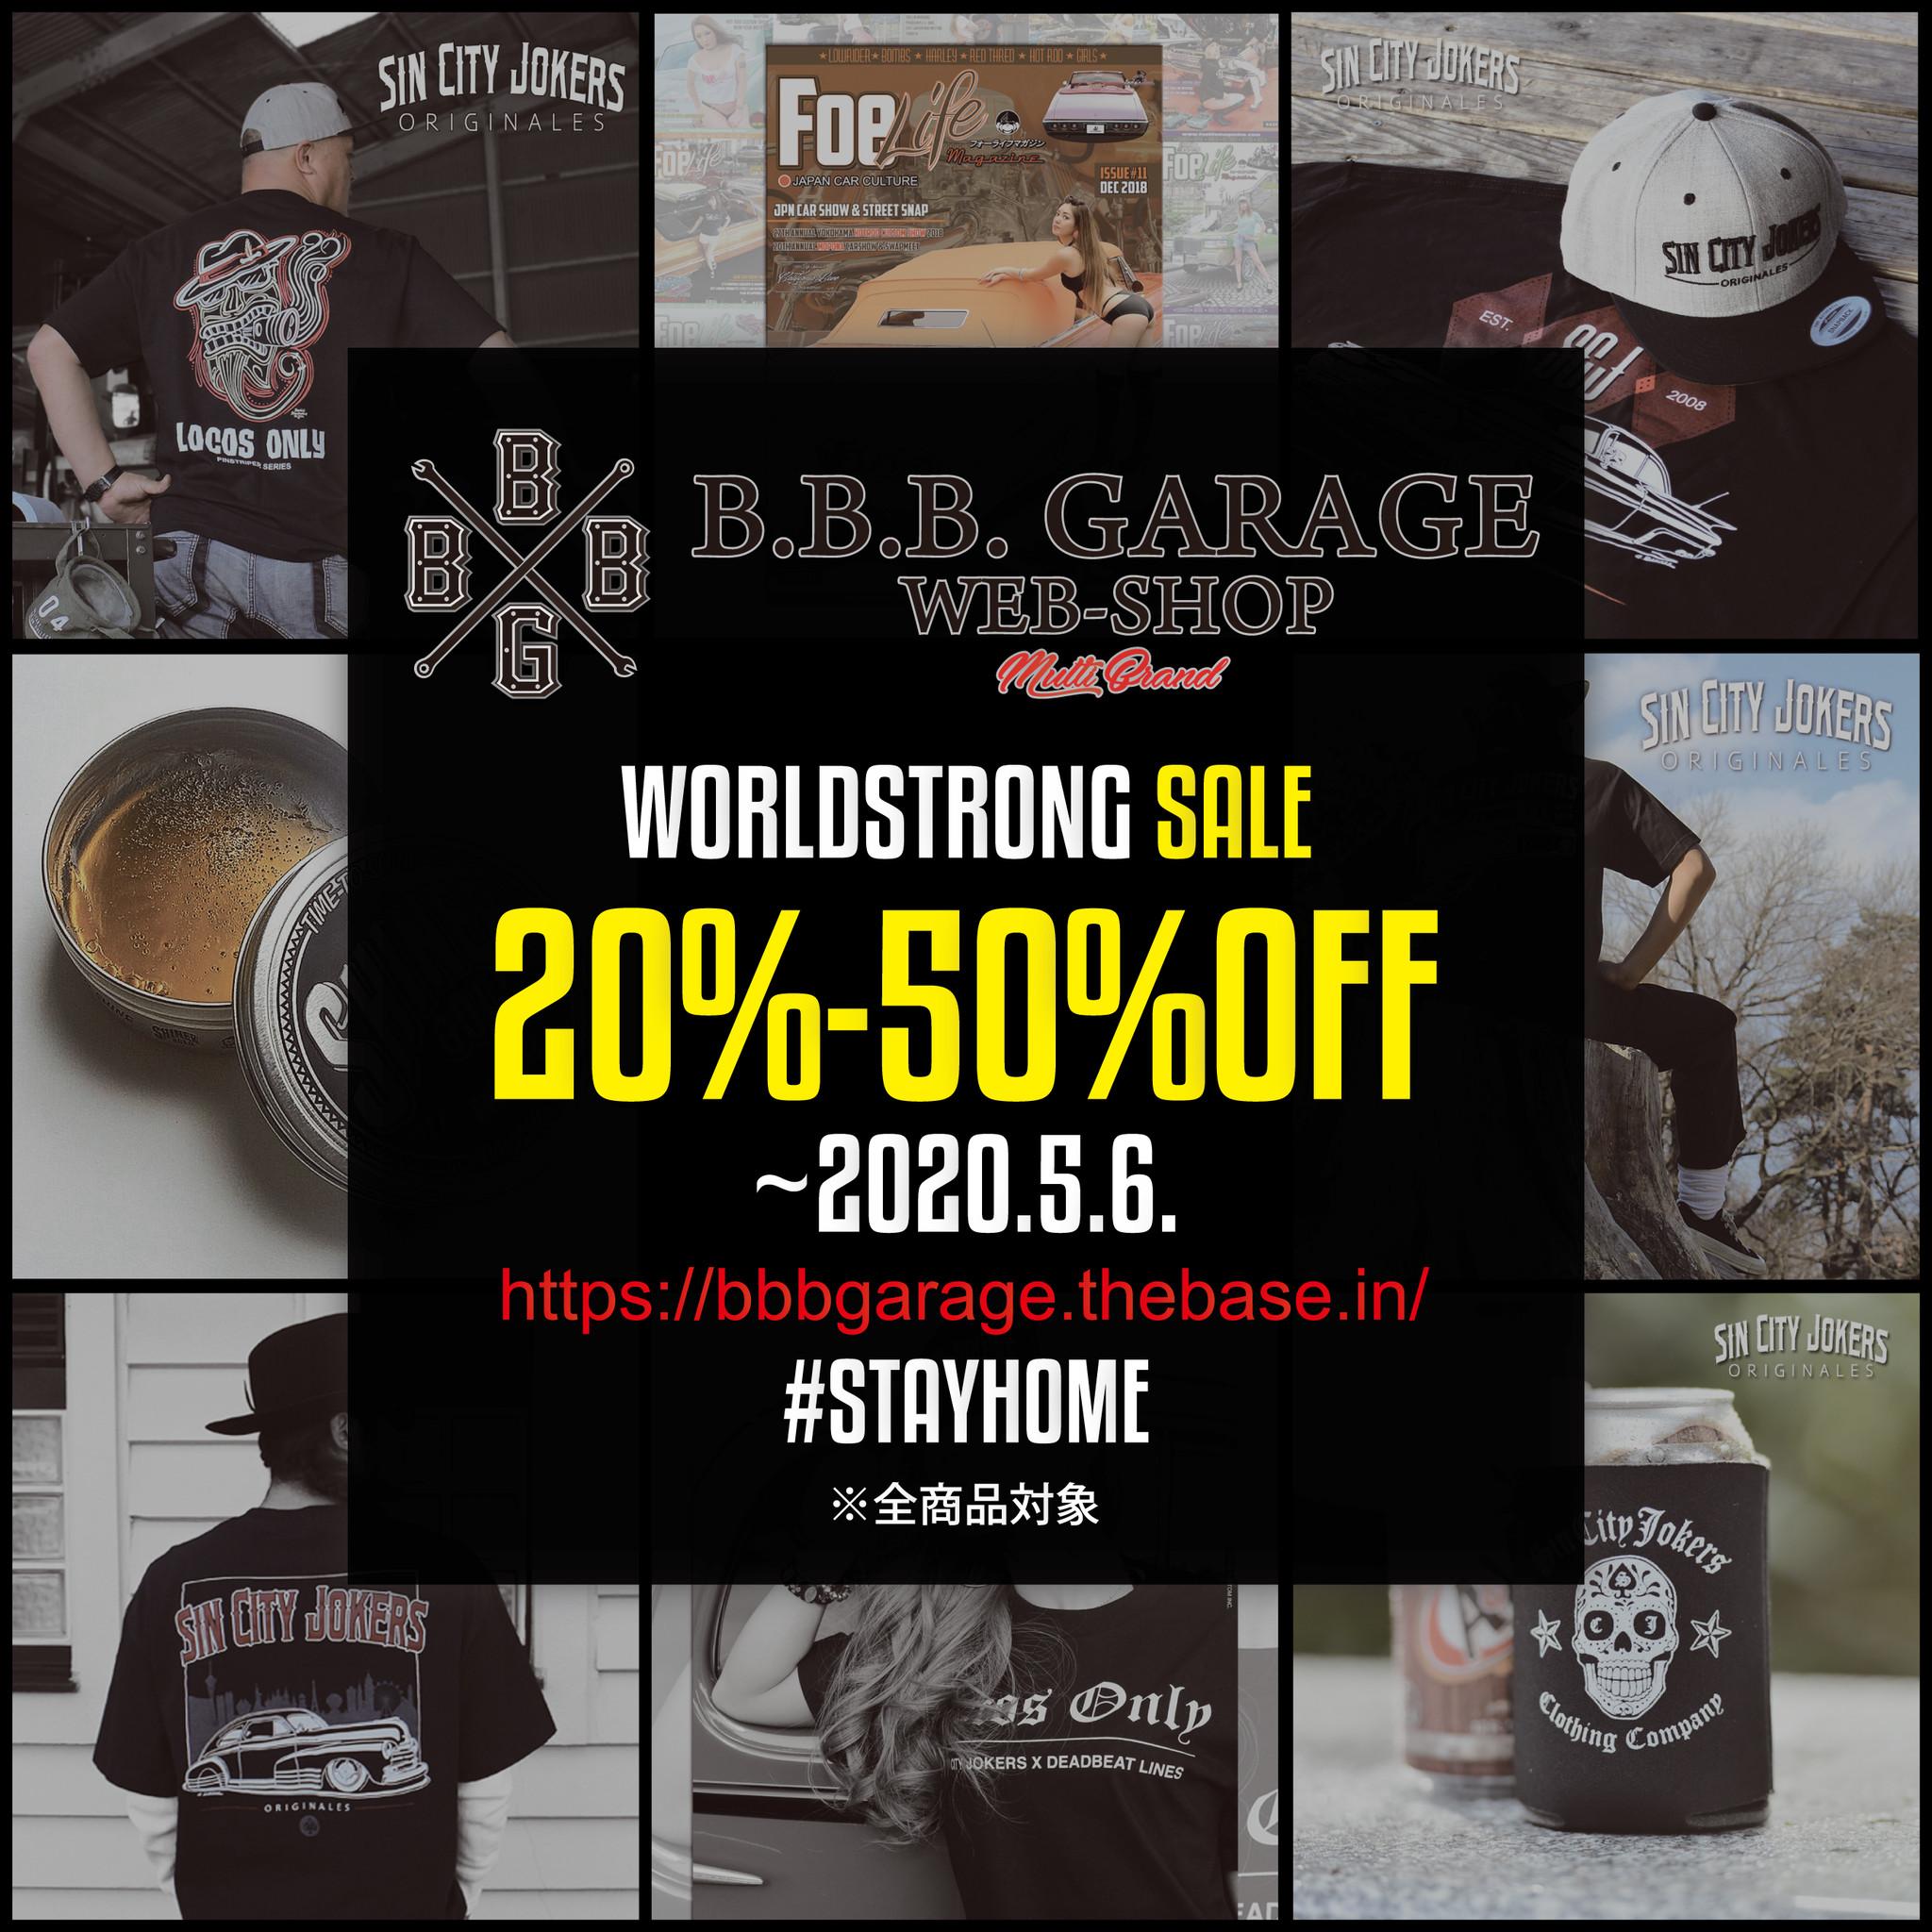 【緊急開催】B.B.B.GARAGE WORLDSTRONG SALE